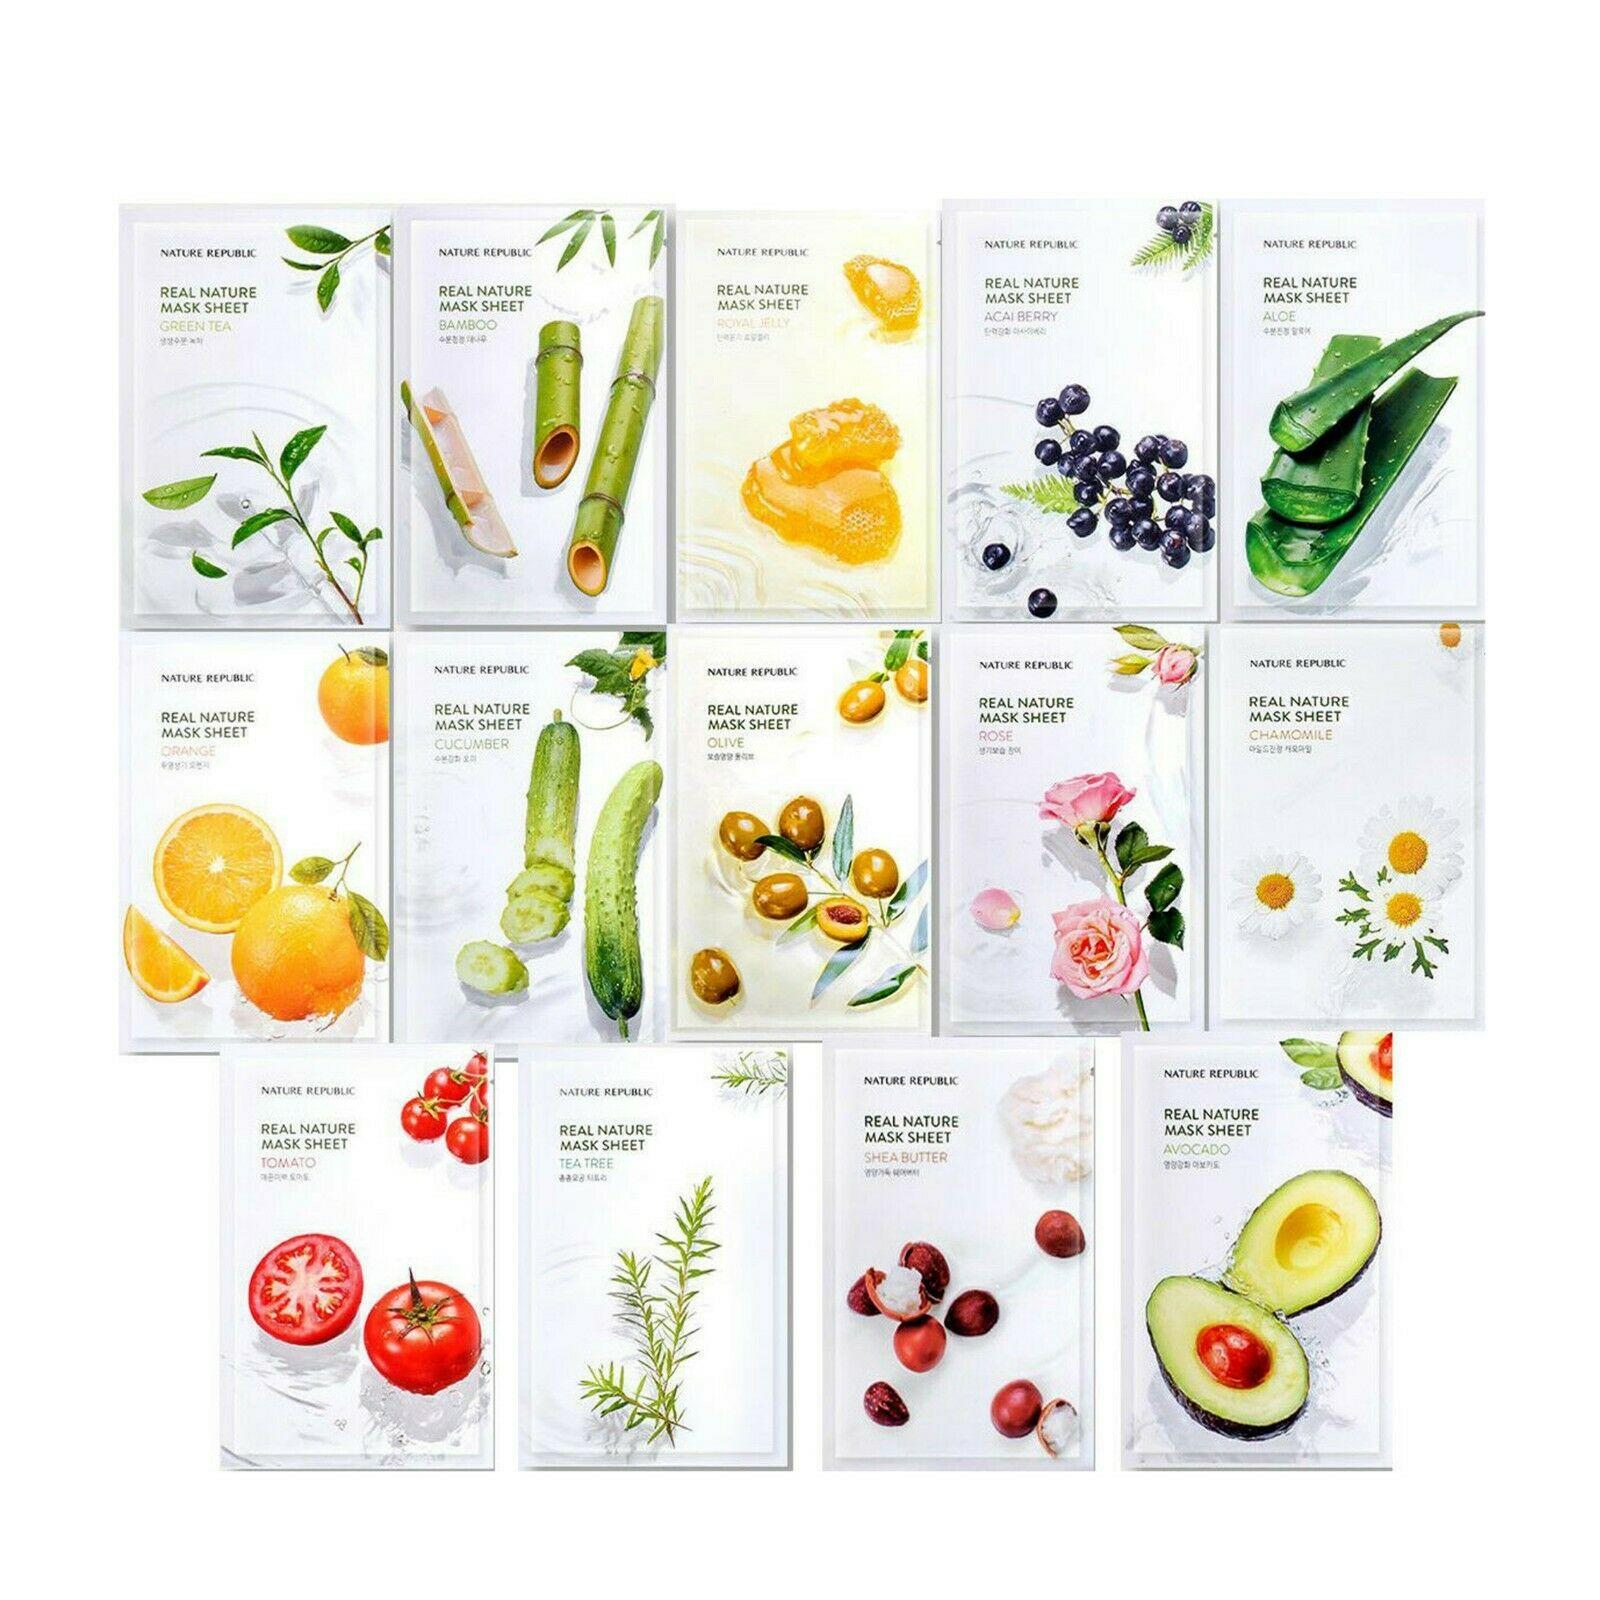 Nature Republic Real Nature Mask Sheets 10pcs/lot Face Mask Moisturizing Oil Control Shrink Pores Skin Care Korea Cosmetics